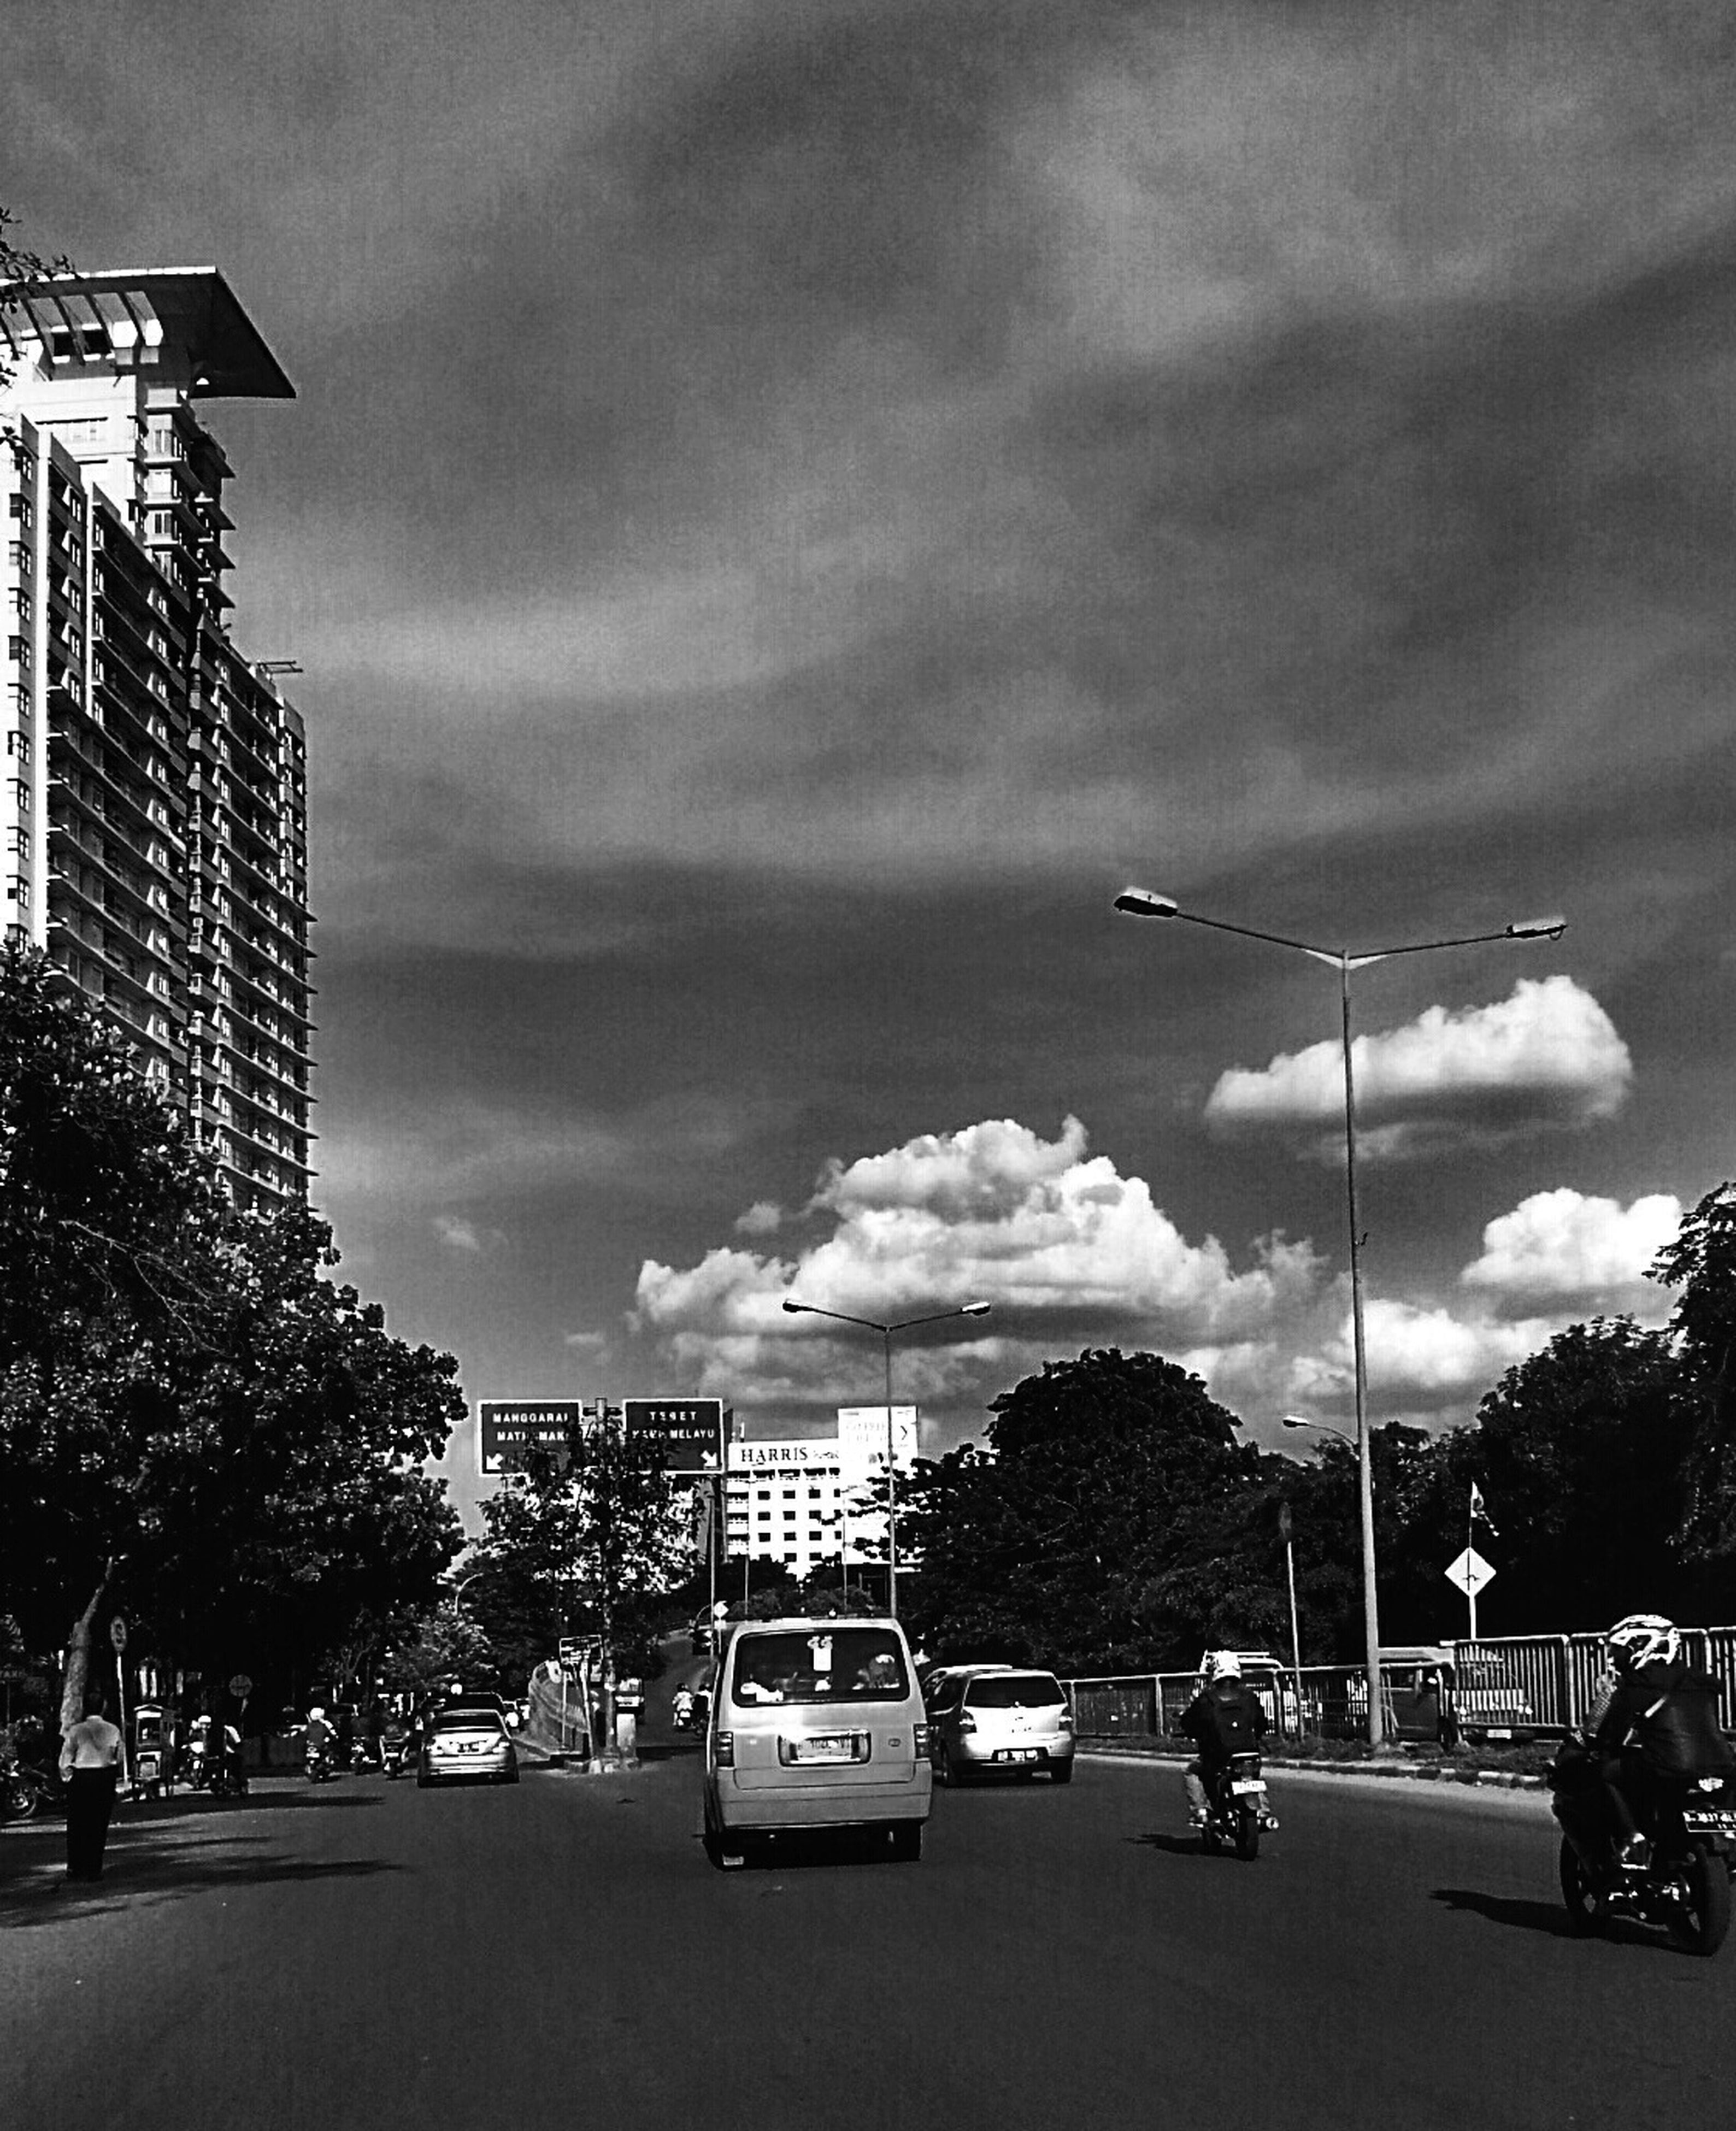 sky, transportation, cloud - sky, building exterior, car, land vehicle, cloudy, mode of transport, built structure, architecture, city, street, street light, road, overcast, cloud, dusk, city life, road marking, city street